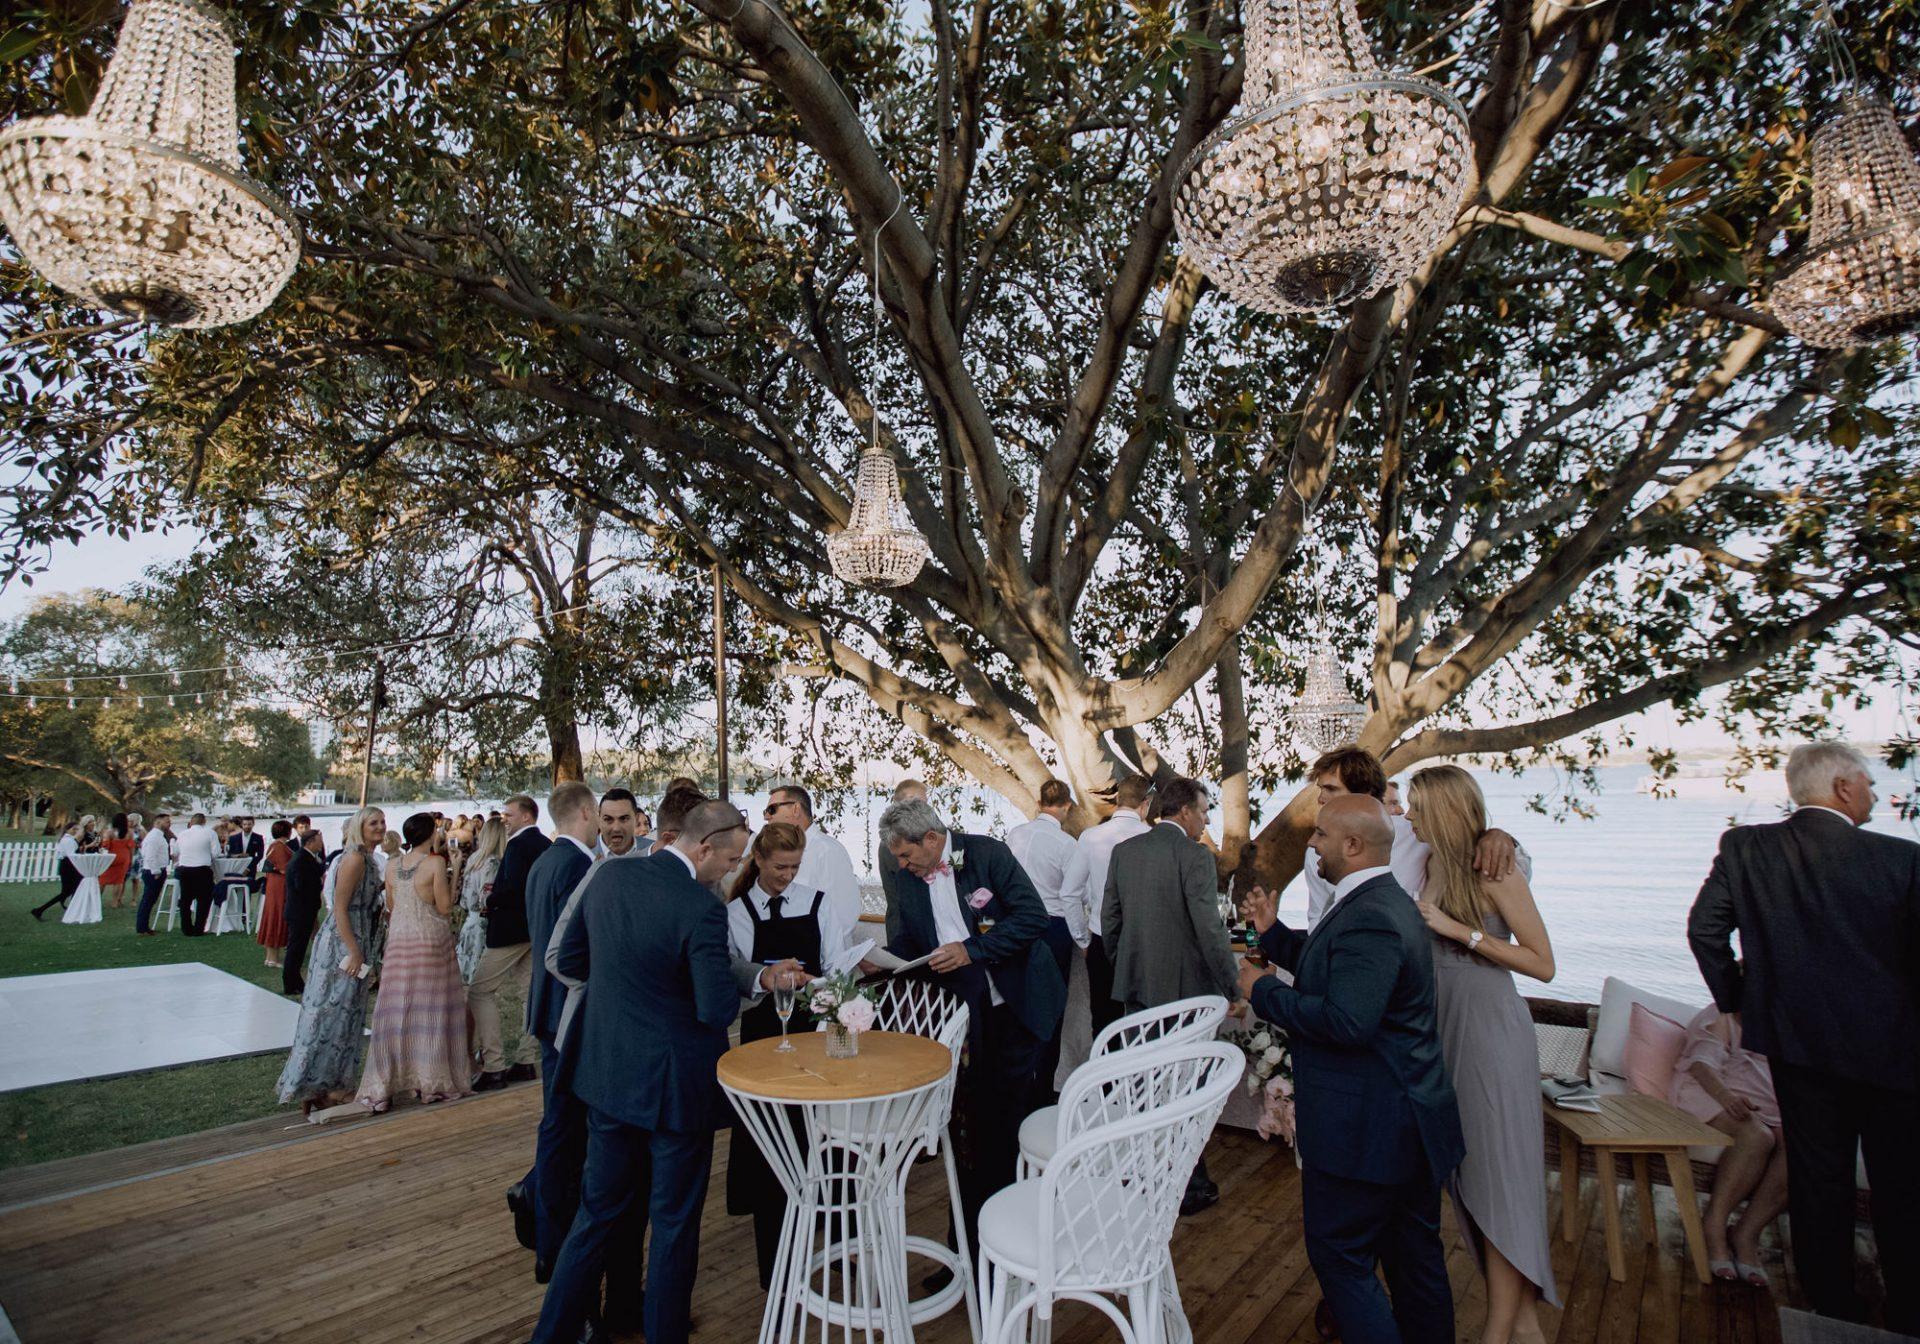 Matilda Bay Wedding under the Trees - Photography - Nick White Weddings